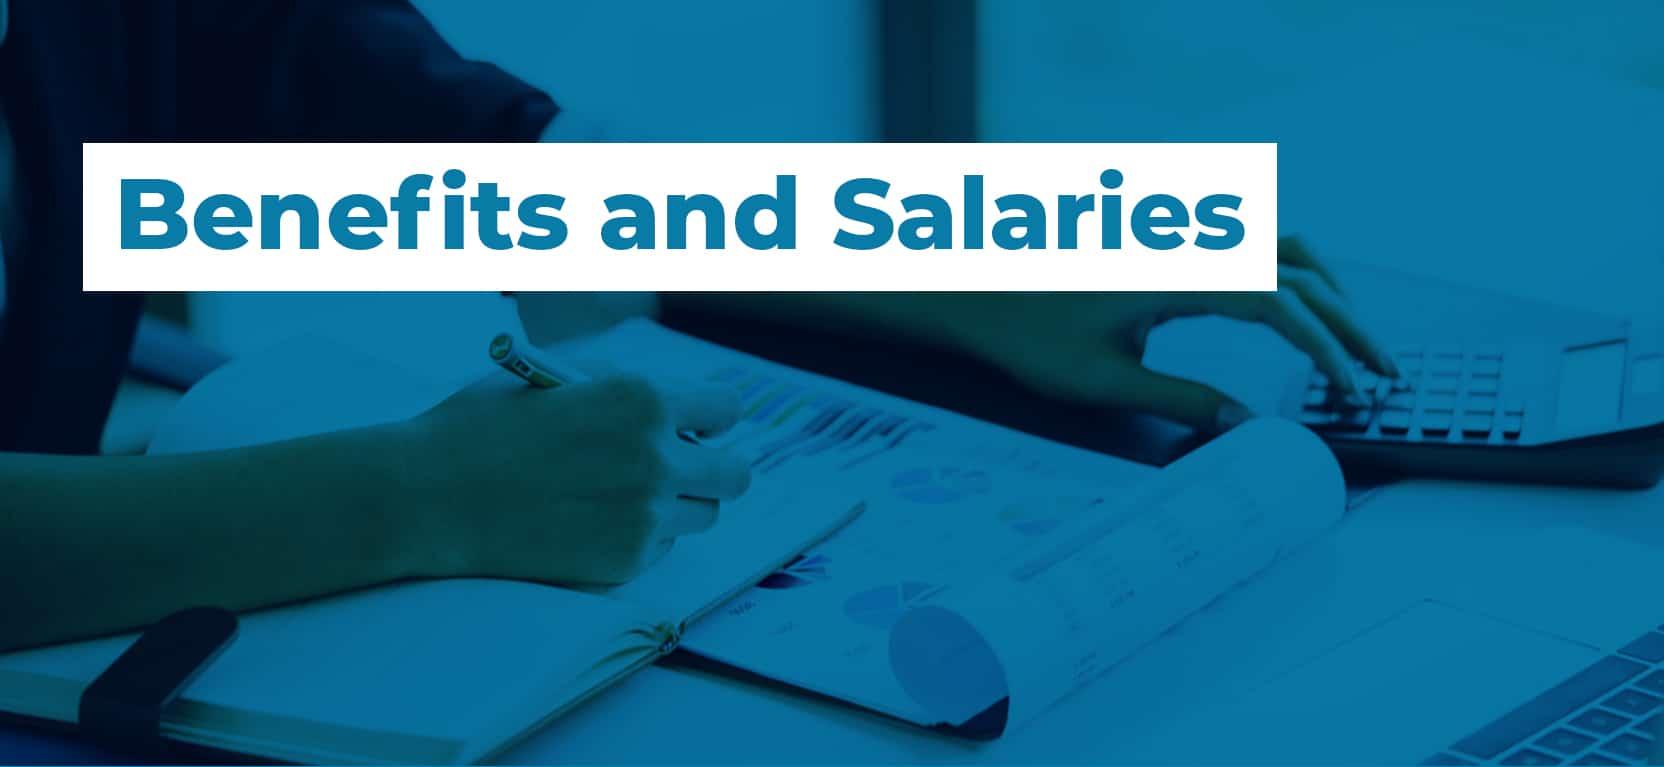 15 Benefits and Salaries